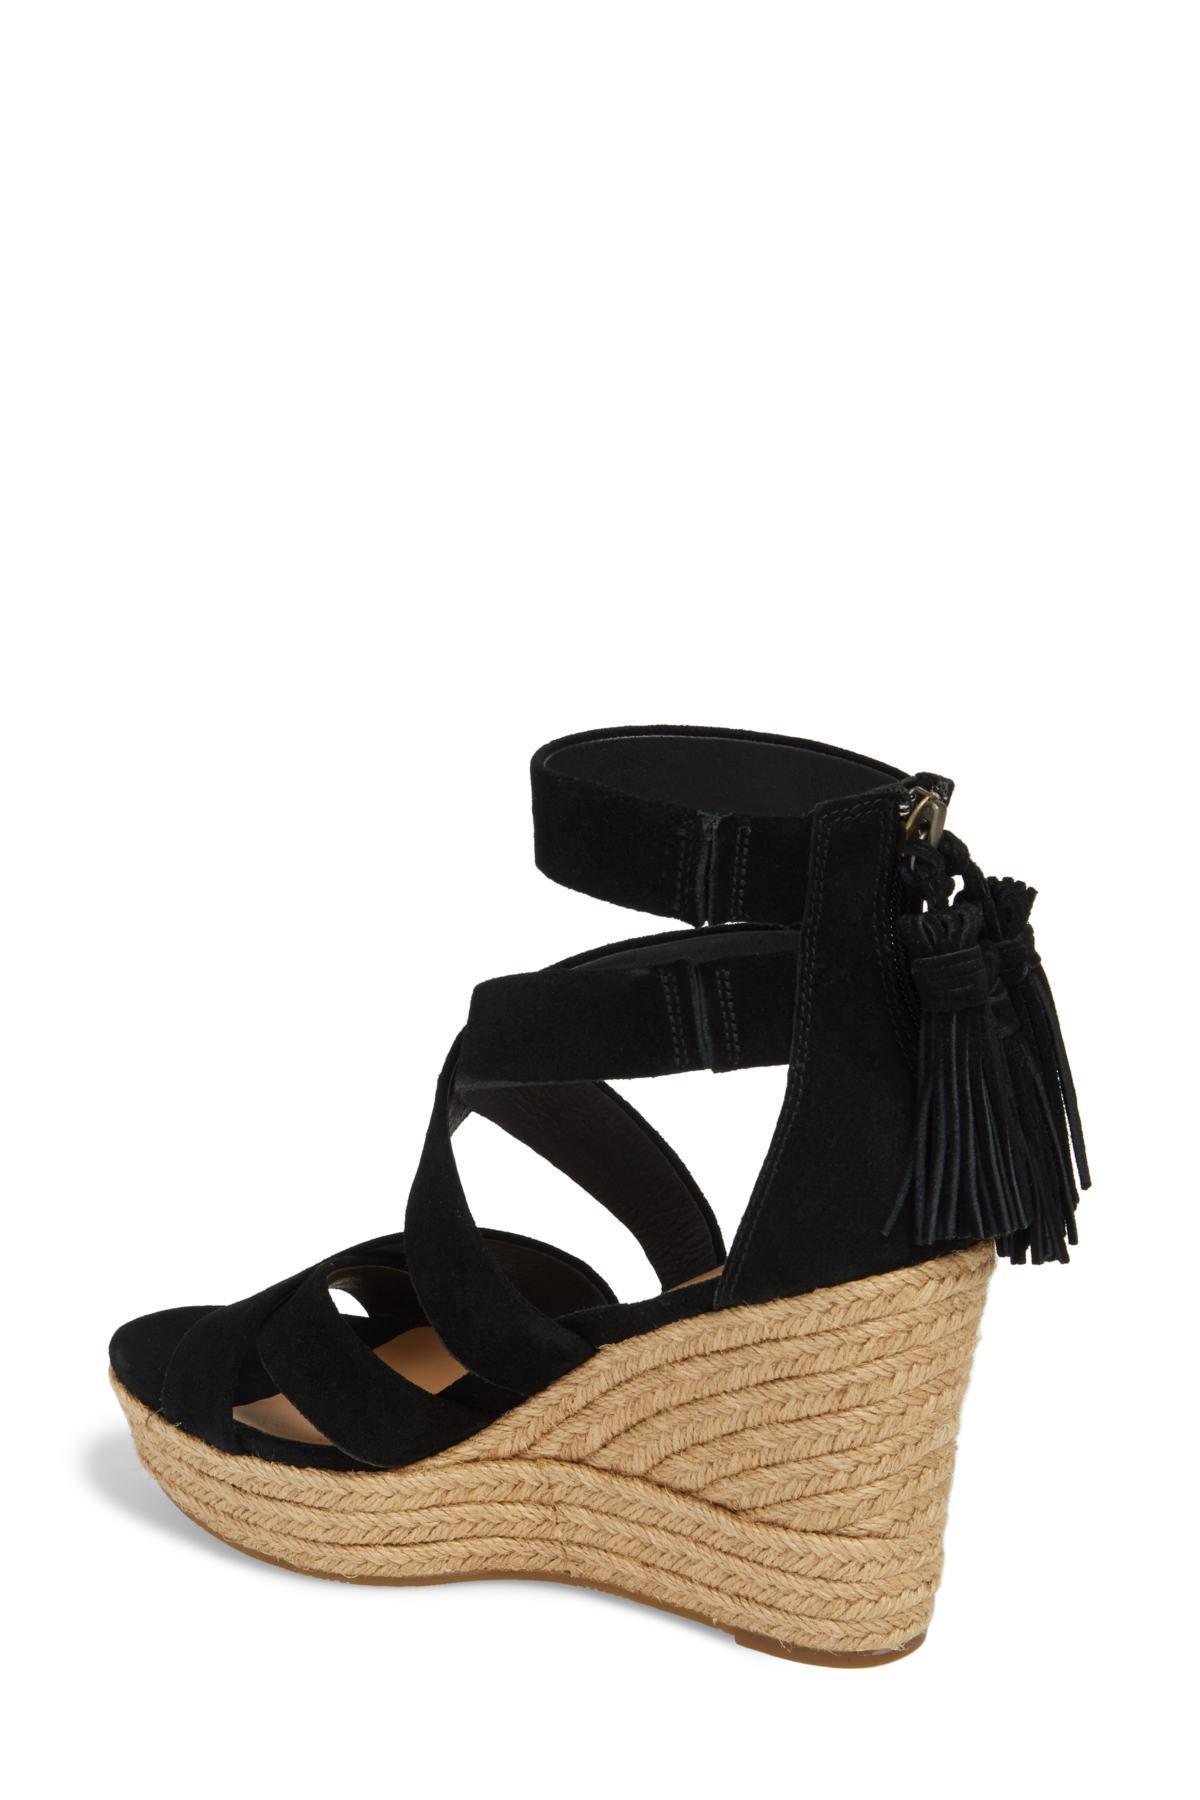 a5b54717464 Lyst - UGG Ugg Raquel Platform Wedge Sandal in Black